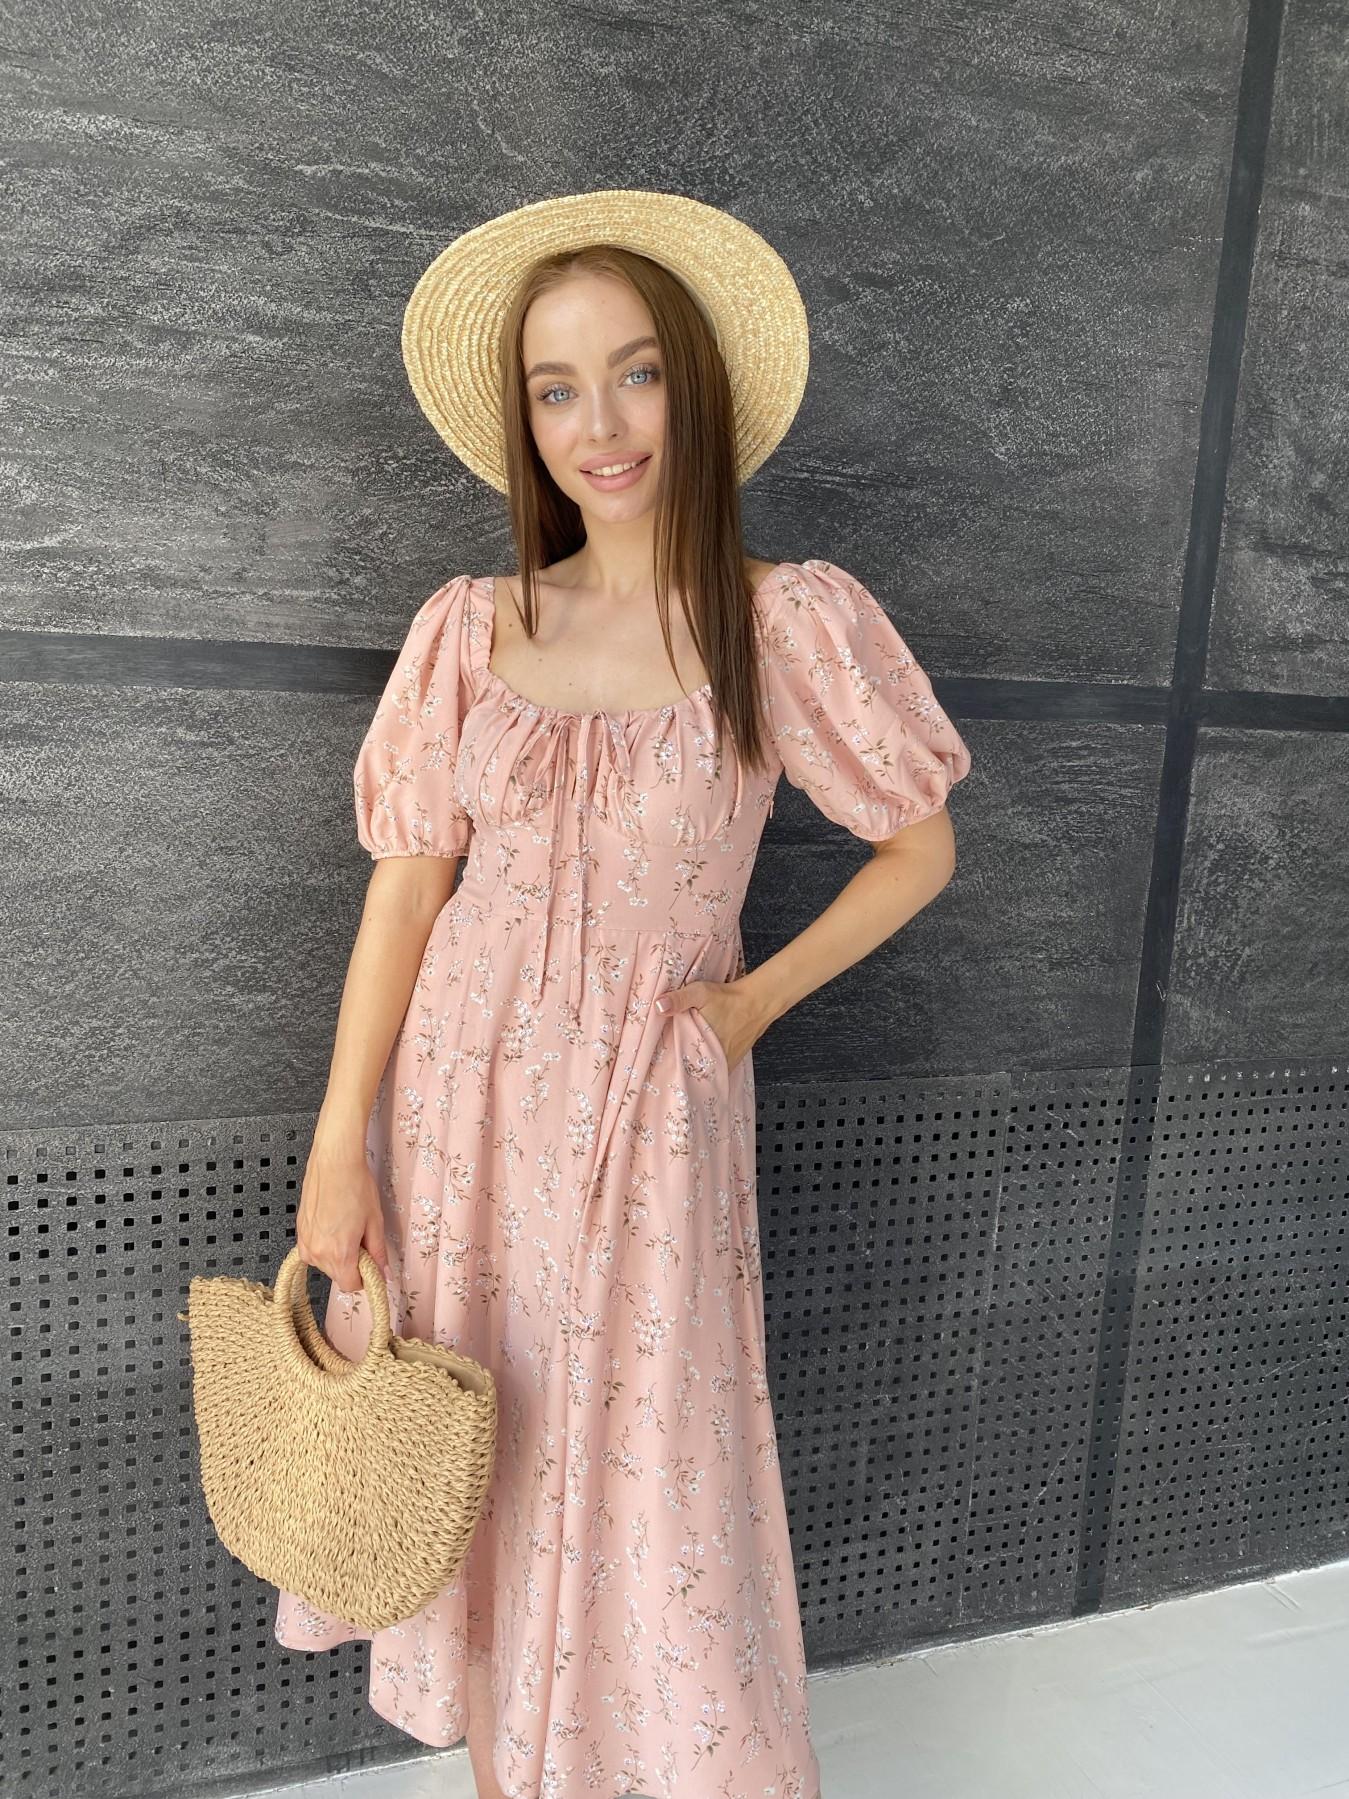 Кисес Миди платье из софт ткани в принт 11348 АРТ. 48150 Цвет: Пудра/букетики/бел/зел - фото 2, интернет магазин tm-modus.ru